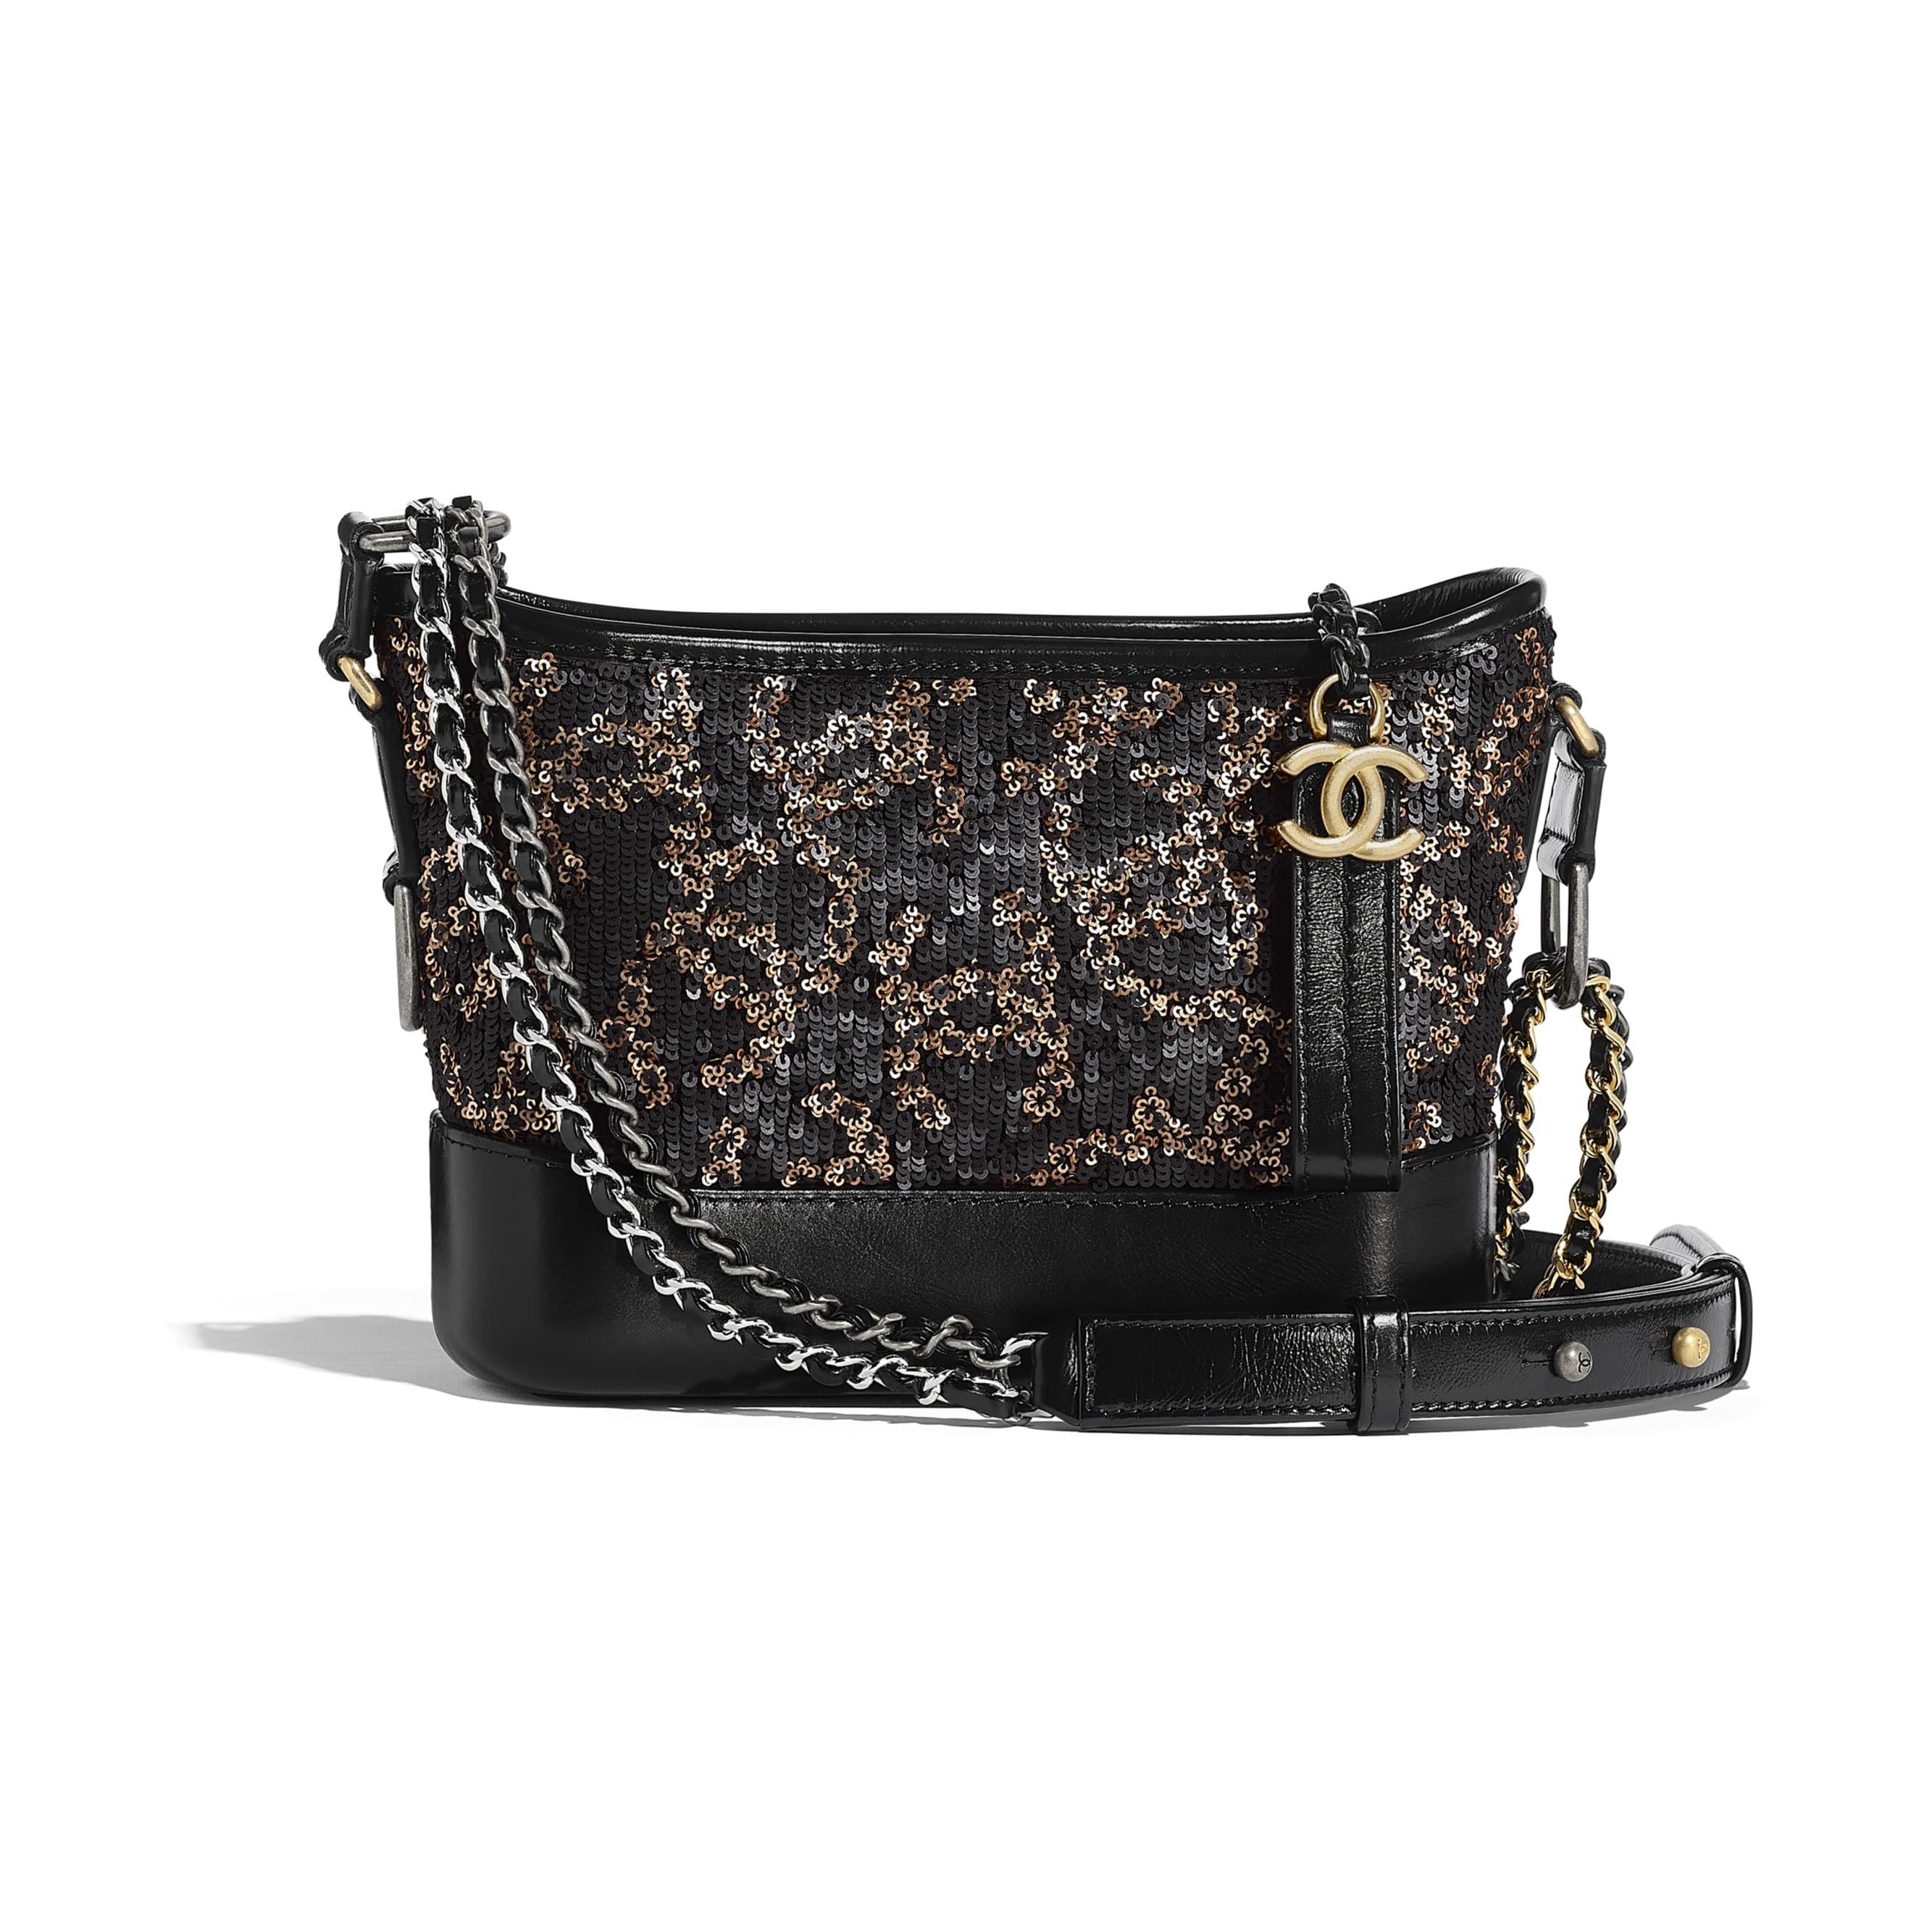 f92889300b18bc Chanel - PRE SS2019   Black & gold sequins, calfskin gold-tone &  silver-tone metal Chanel's Gabrielle Small Hobo bag ($5,100)